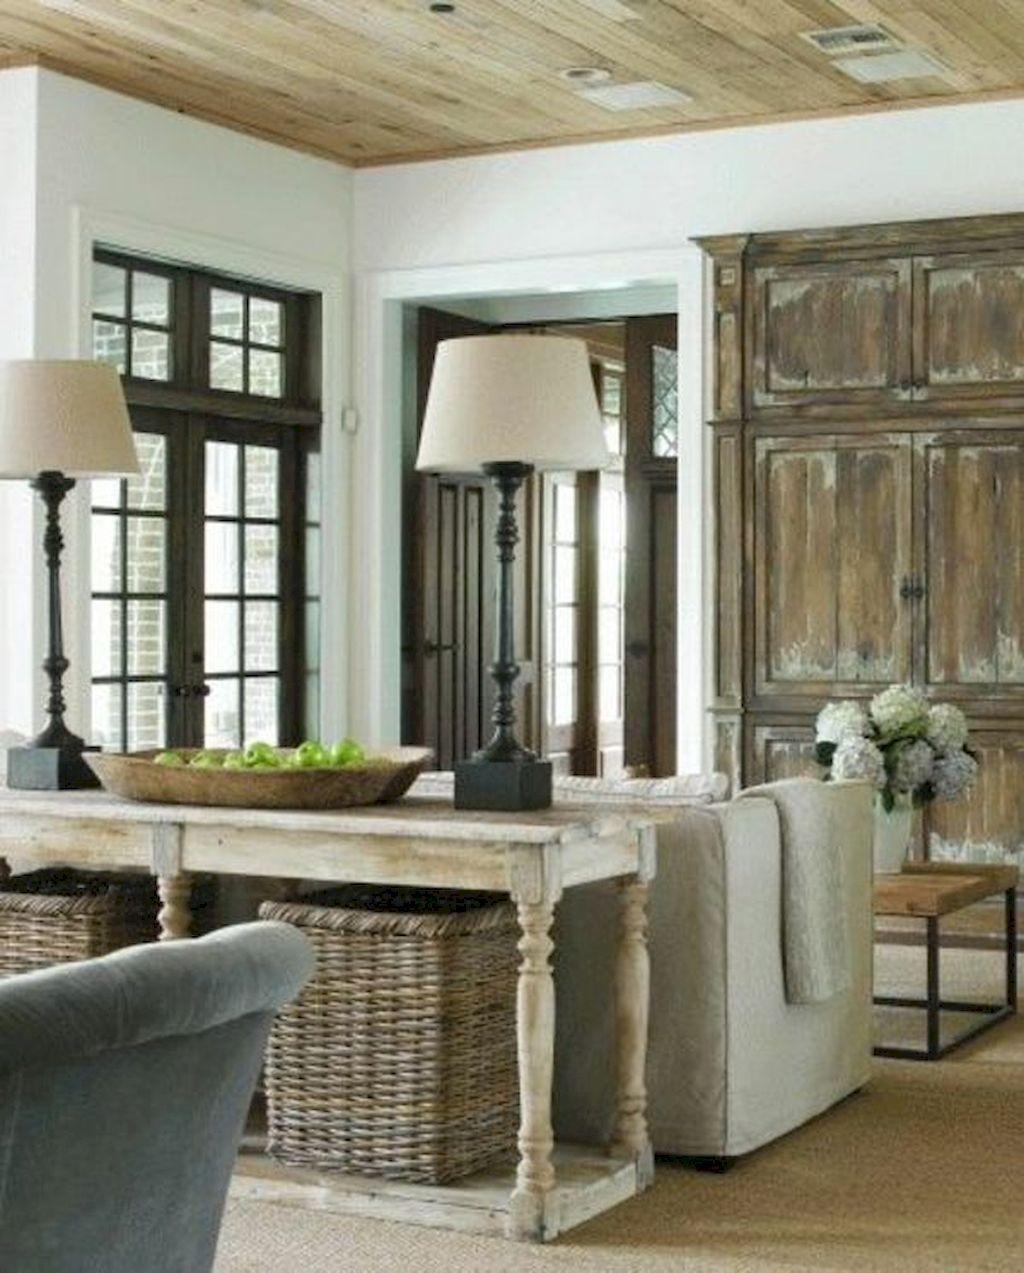 Cool 80 Cozy Farmhouse Living Room Makeover Decor Ideas https://decorapartment.com/80-cozy-farmhouse-living-room-makeover-decor-ideas/